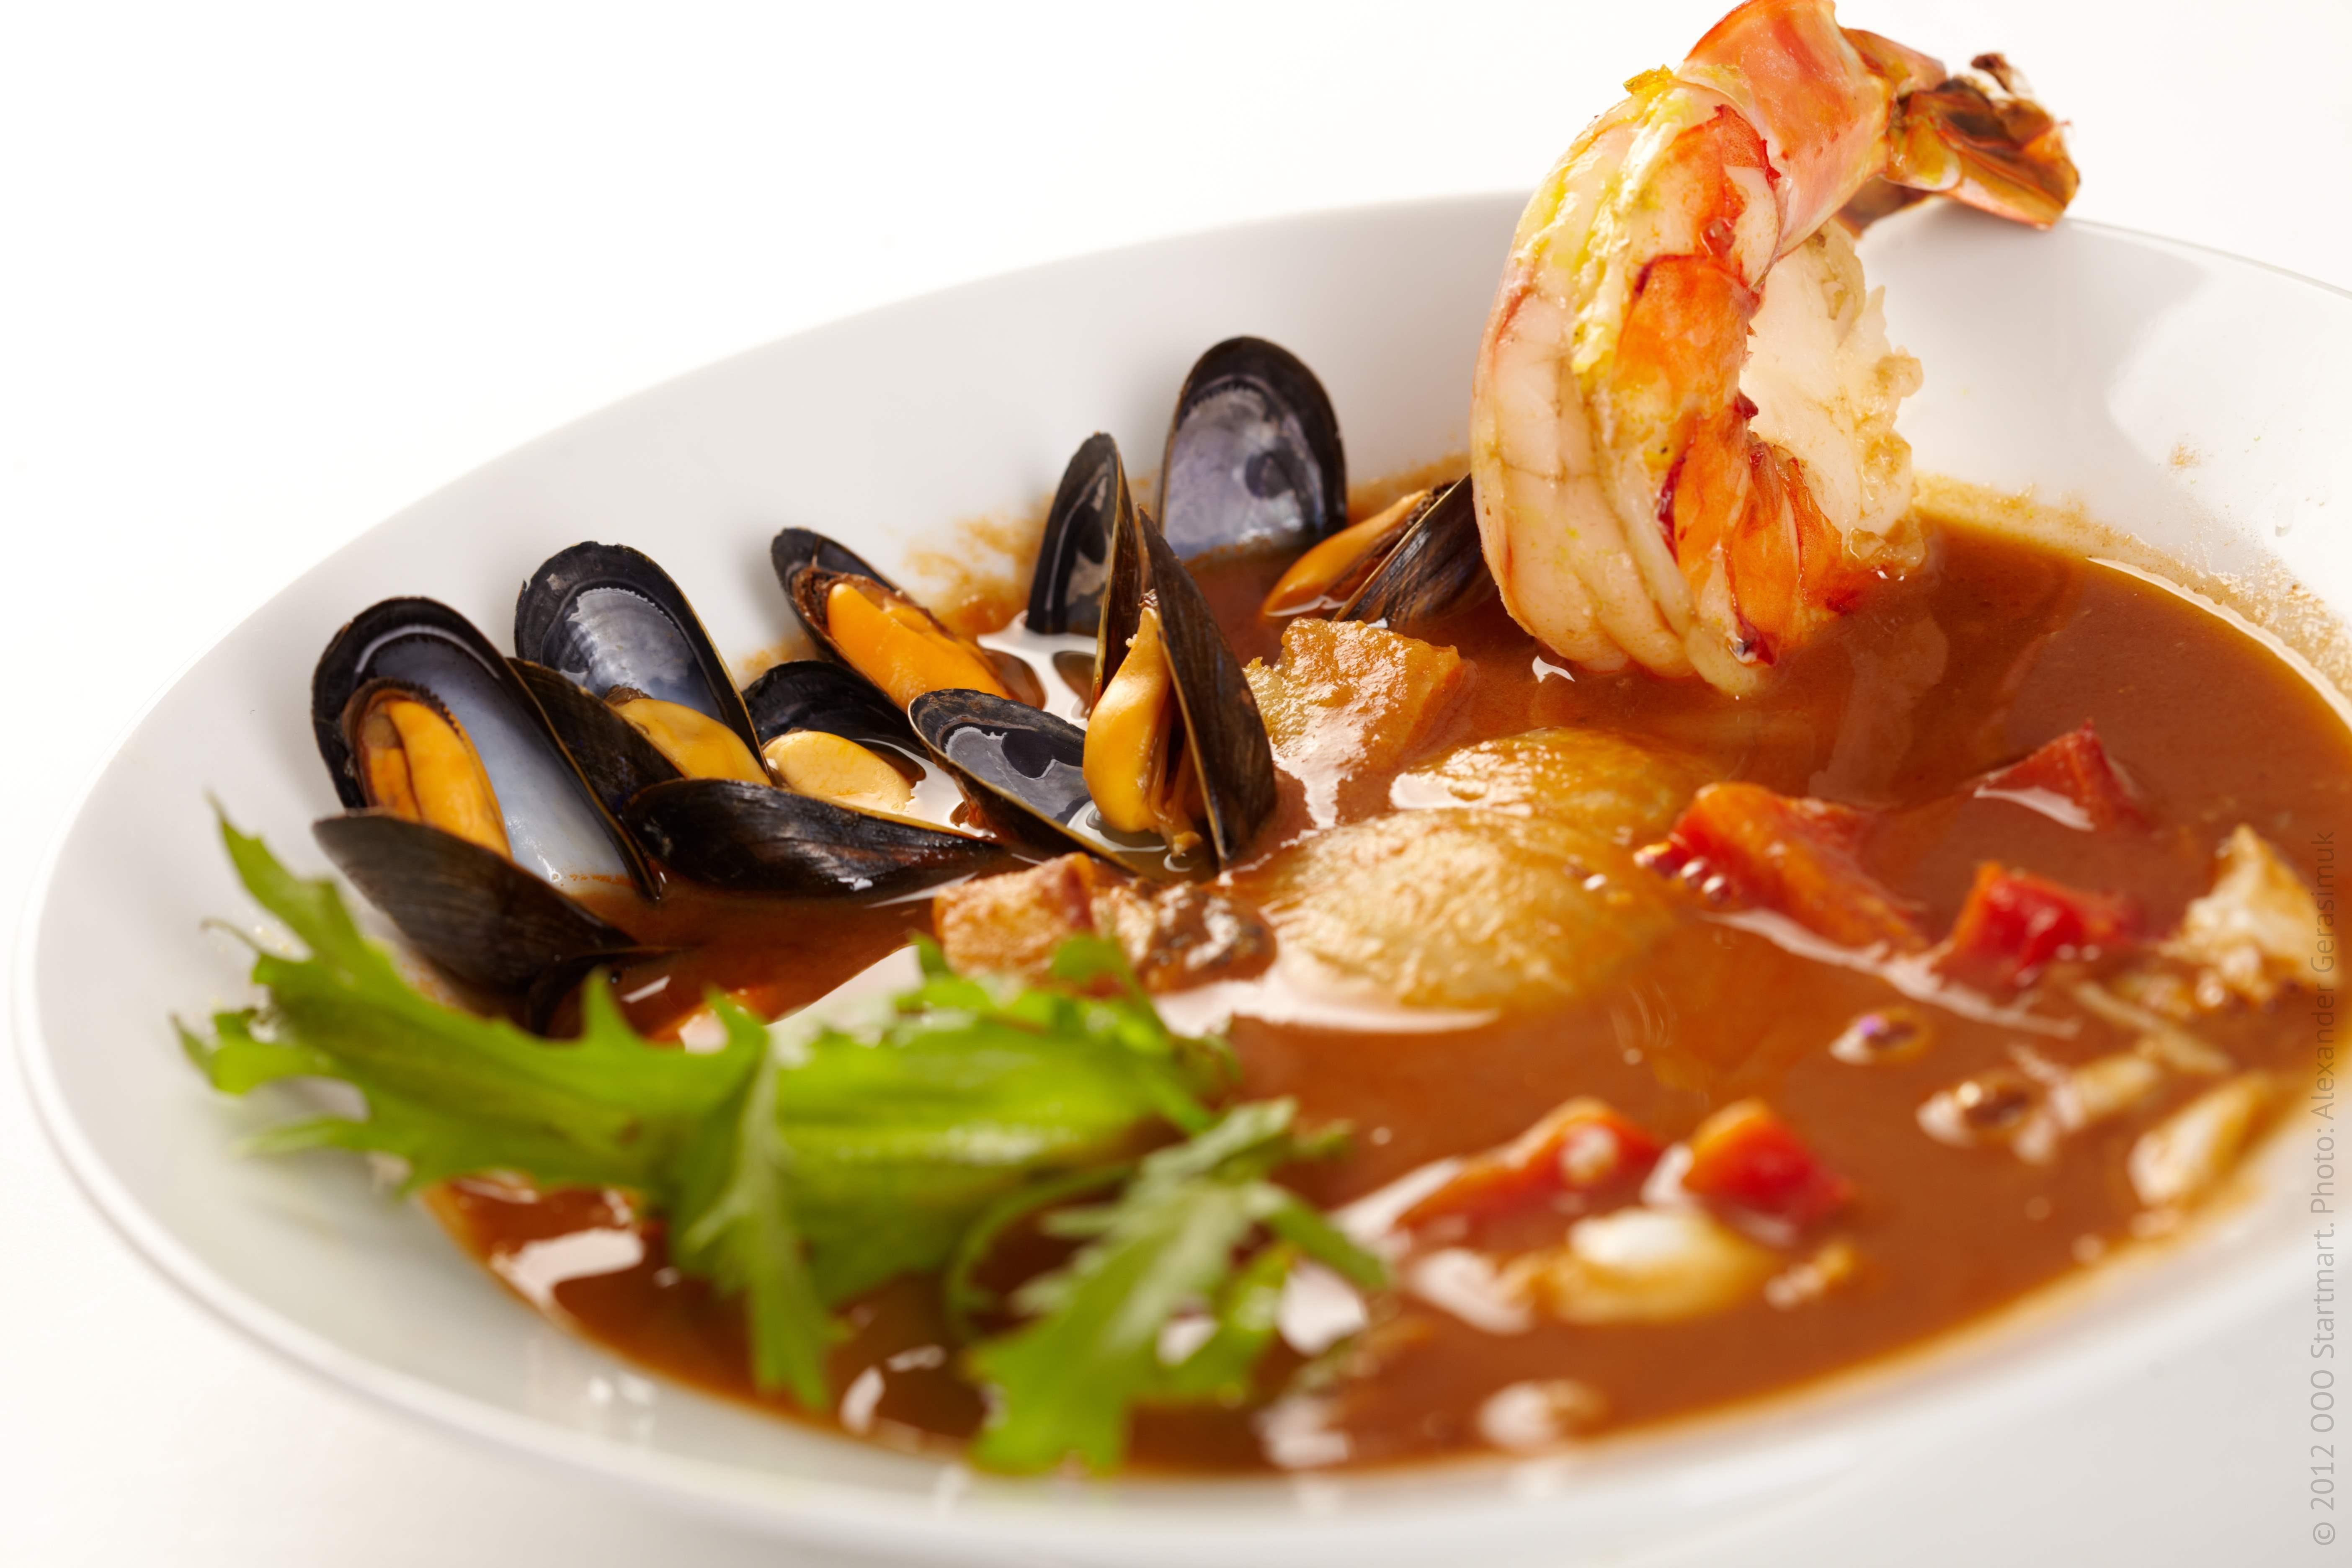 France_cuisine_2 Франция Франция France cuisine 2